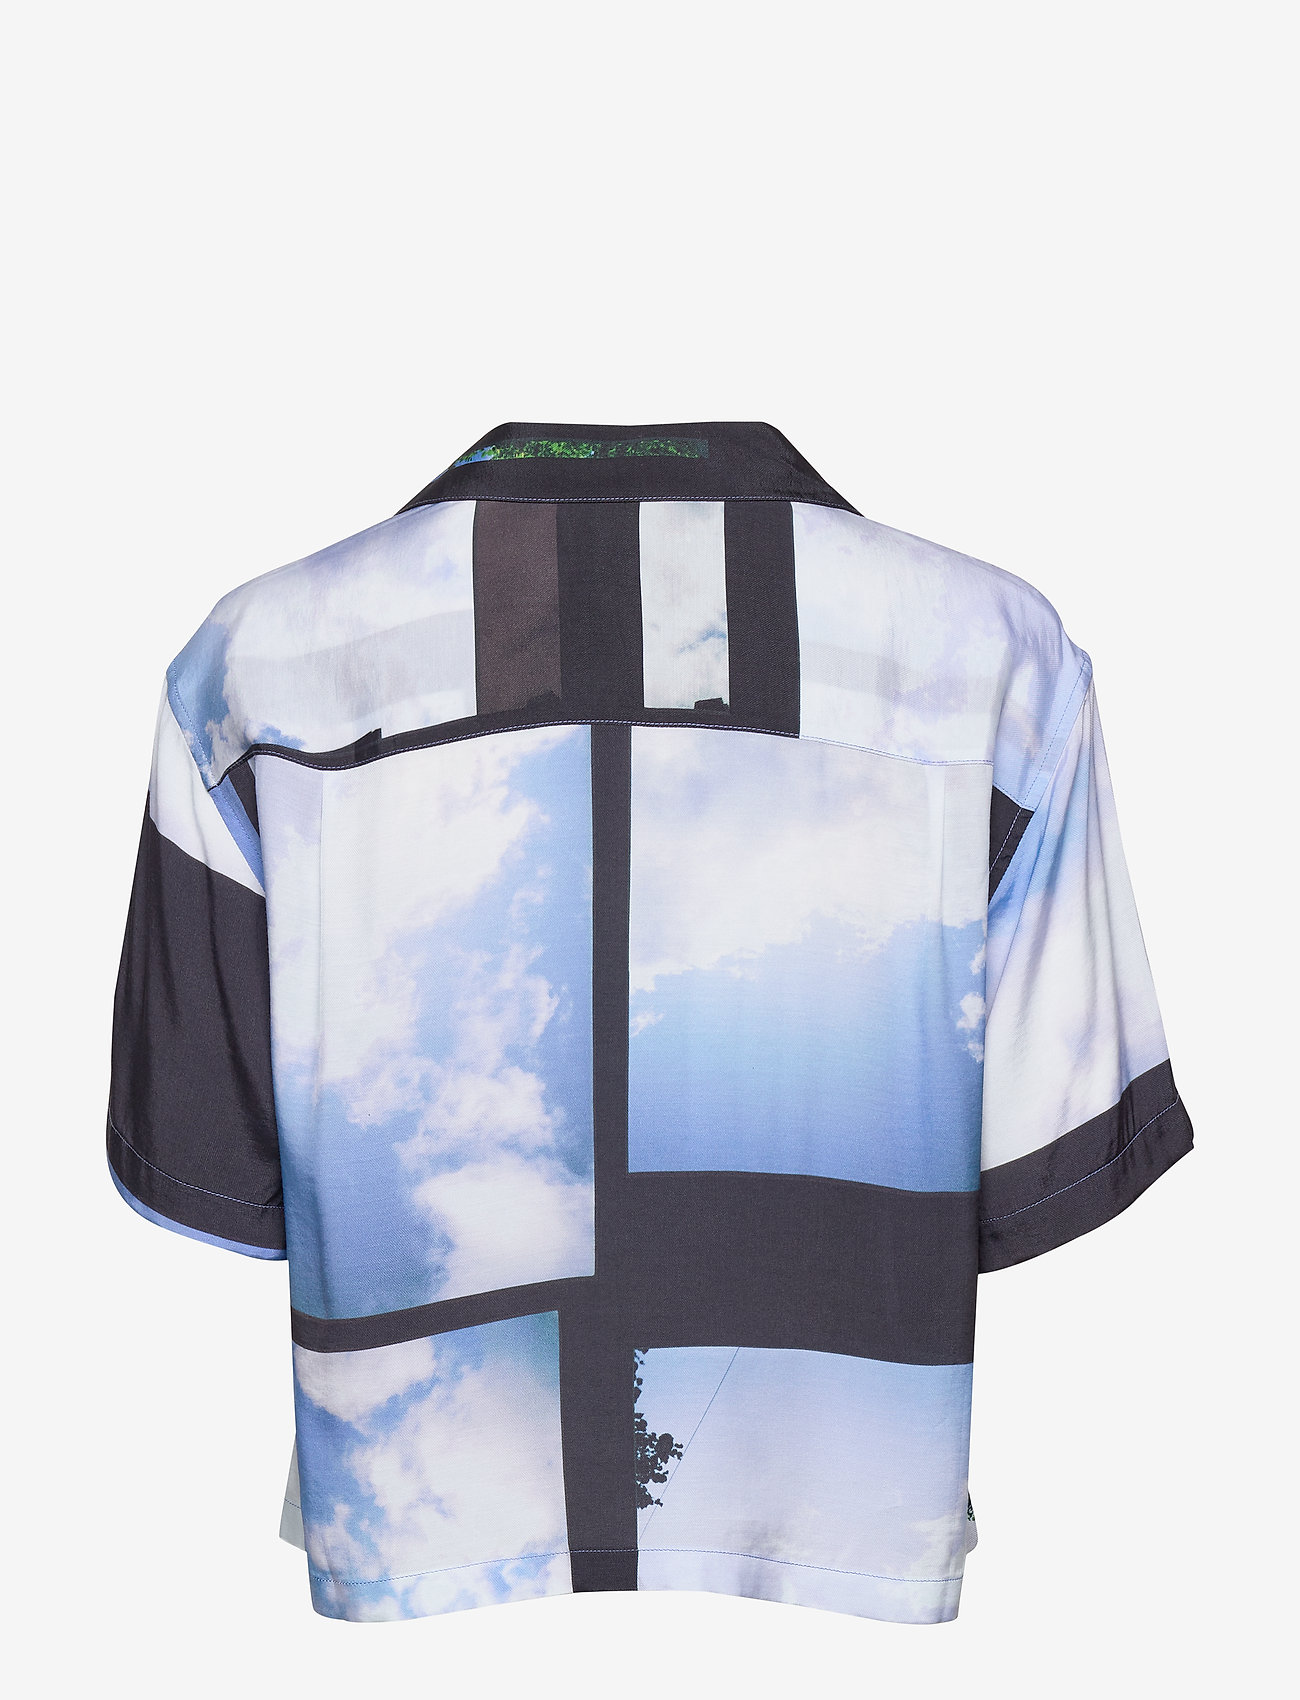 Hope - Short Shirt - overhemden met korte mouwen - heaven blue print - 1